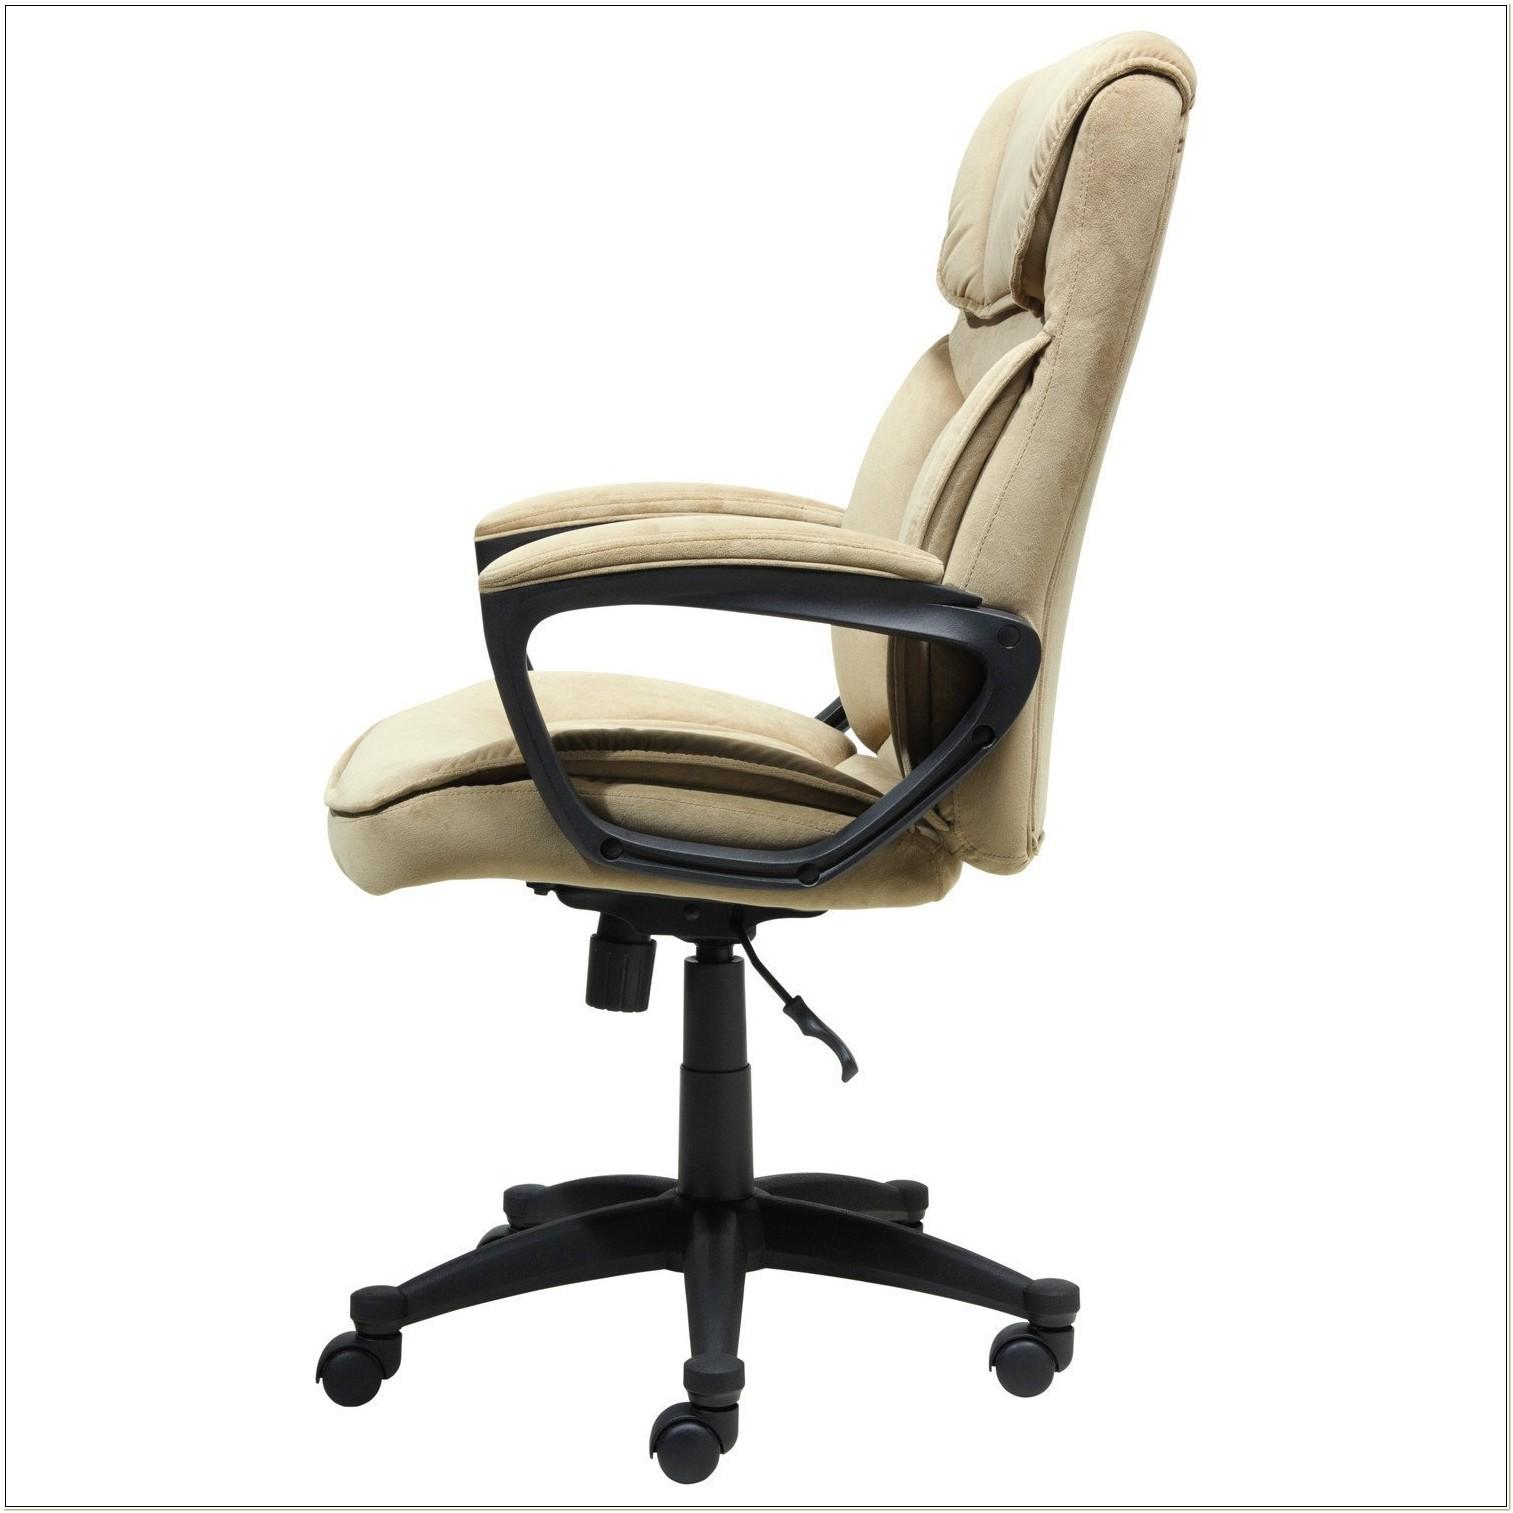 Serta Executive High Back Chair Microfiber